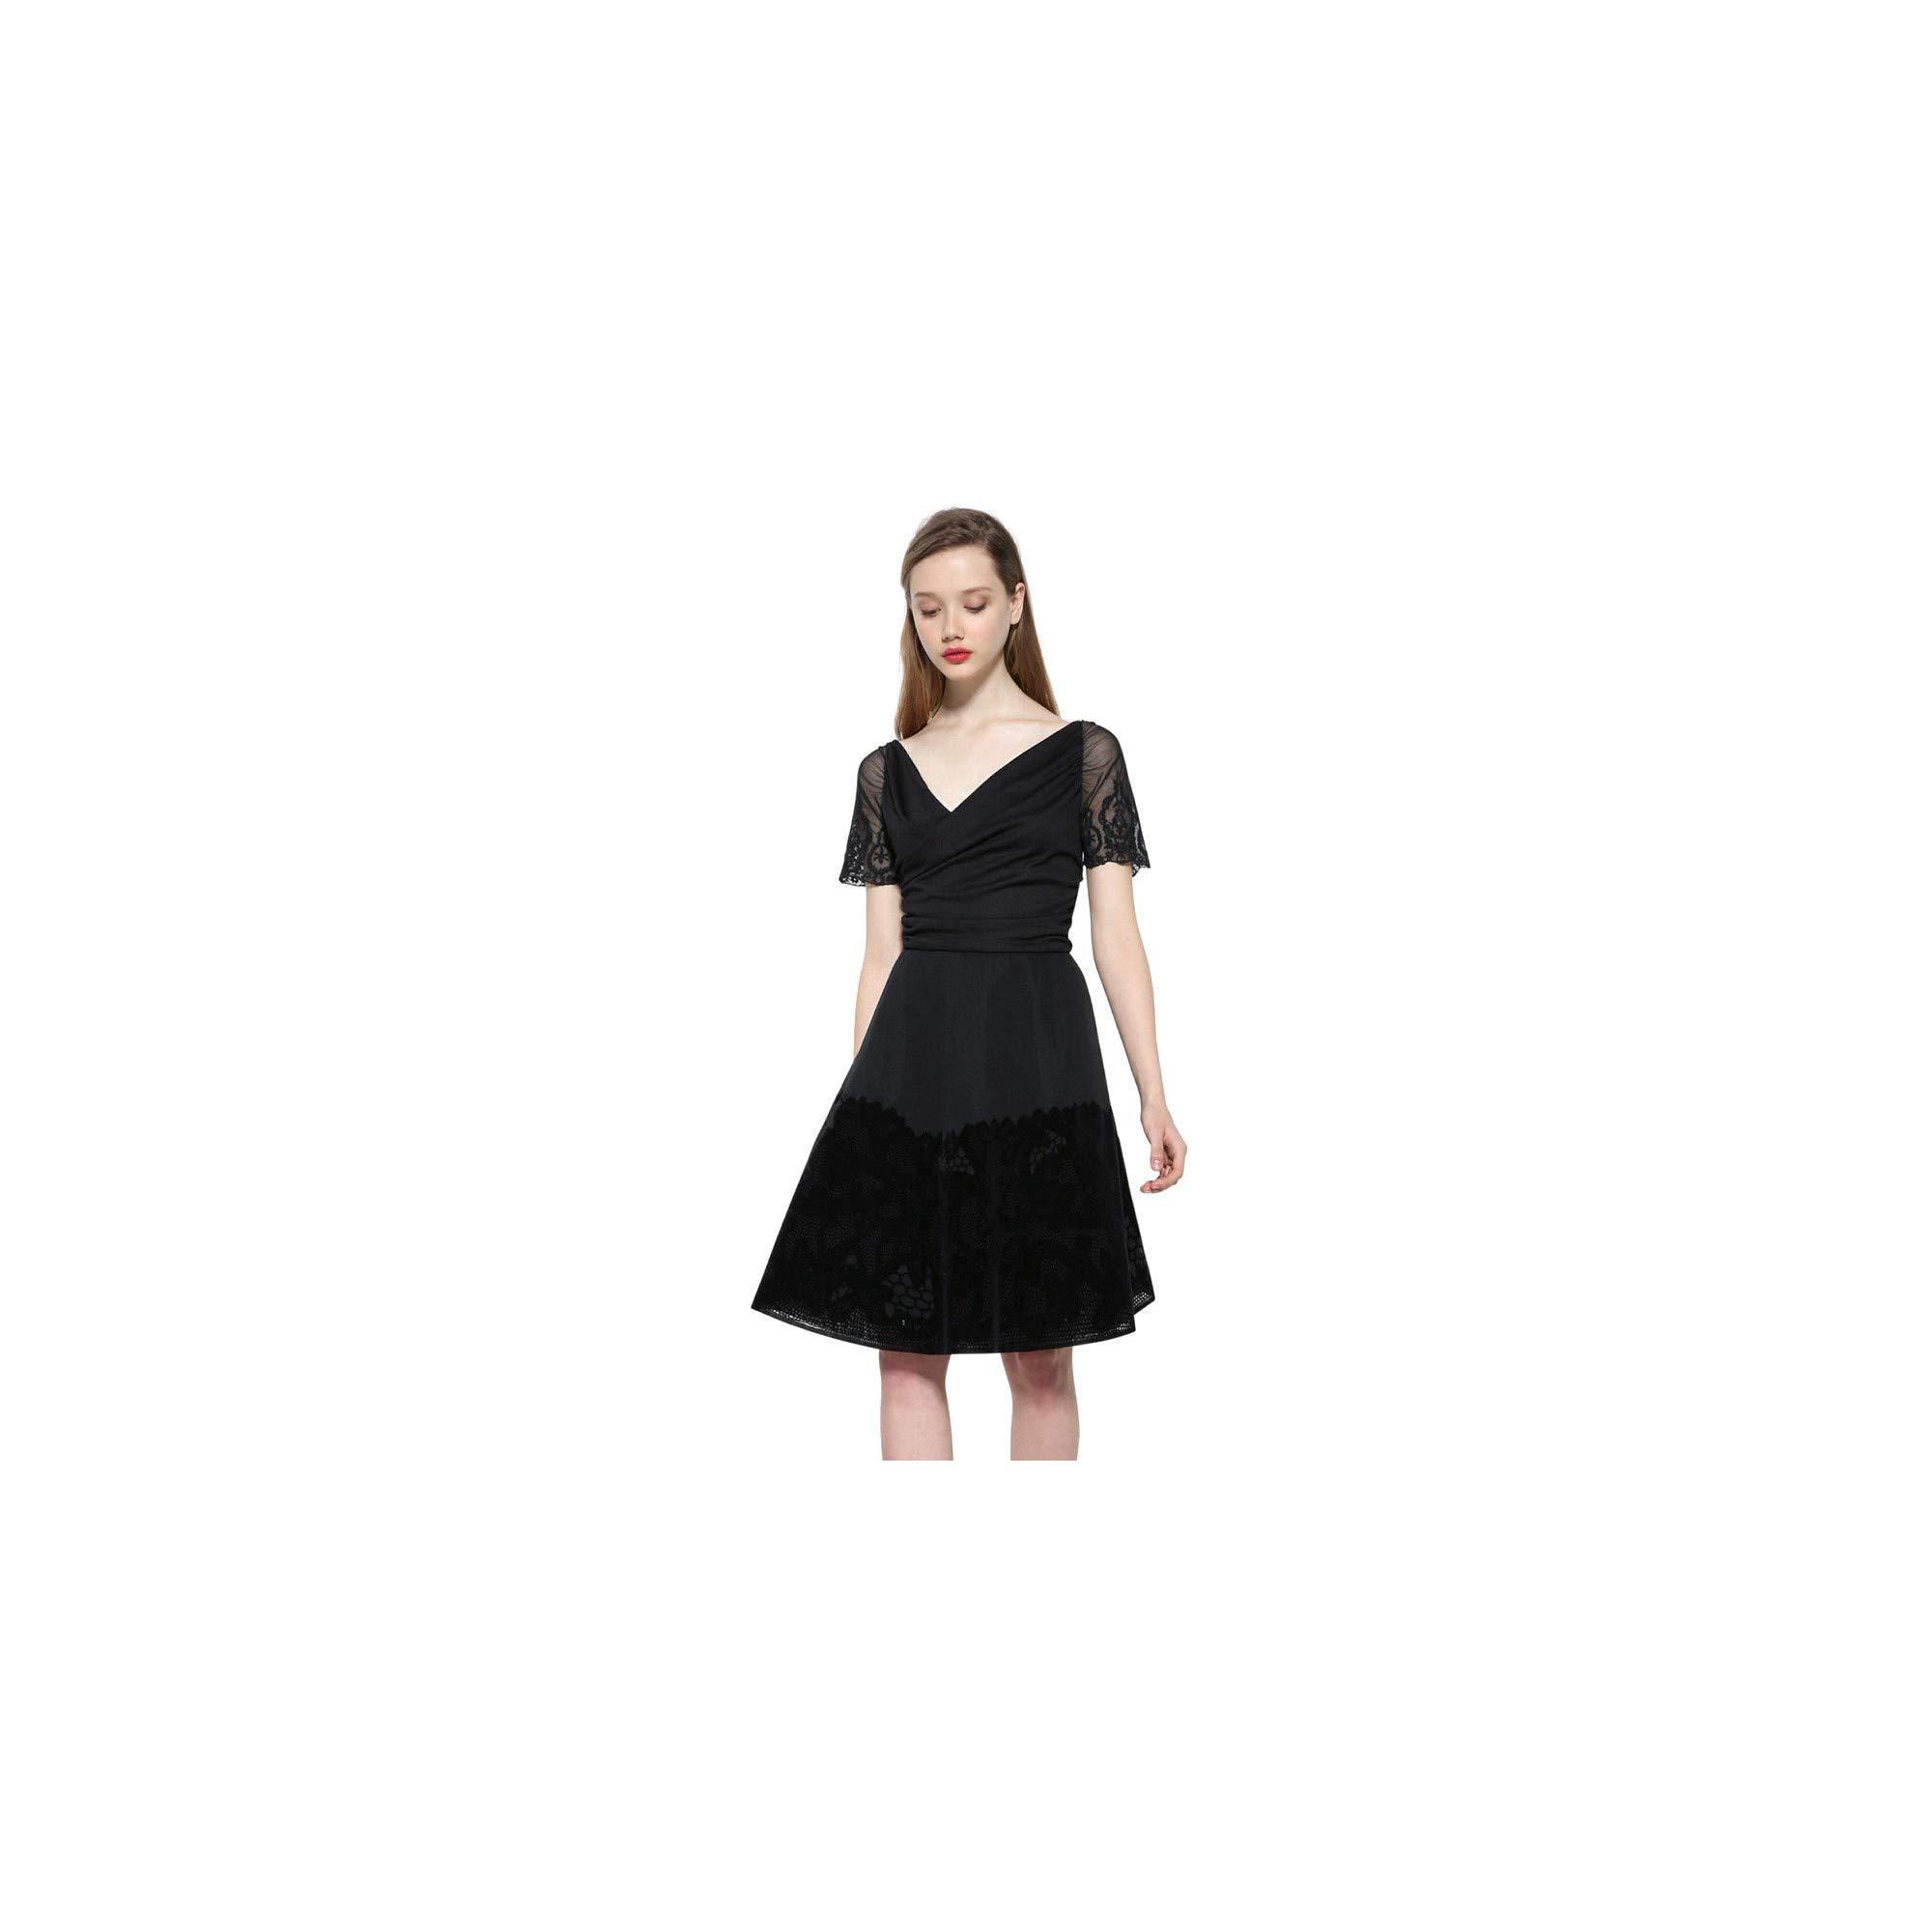 Desigual Robe Betty Noir 17wwvk68 Buy Online In Vanuatu At Desertcart